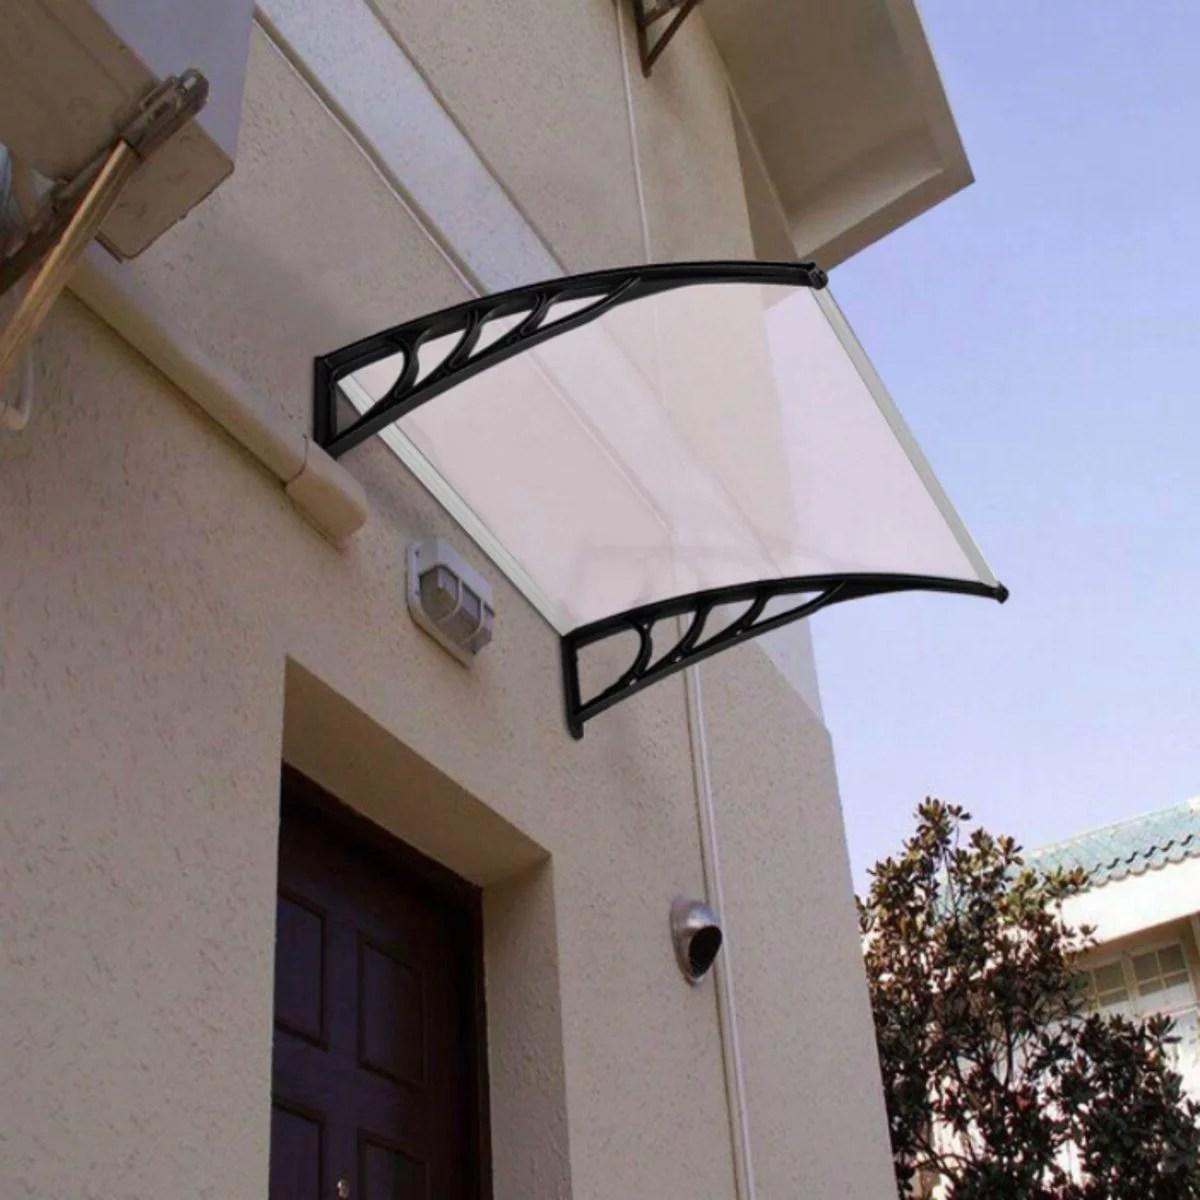 outdoor door window awning canopy shetter patio garden cover sun shade rain snow protection blocker